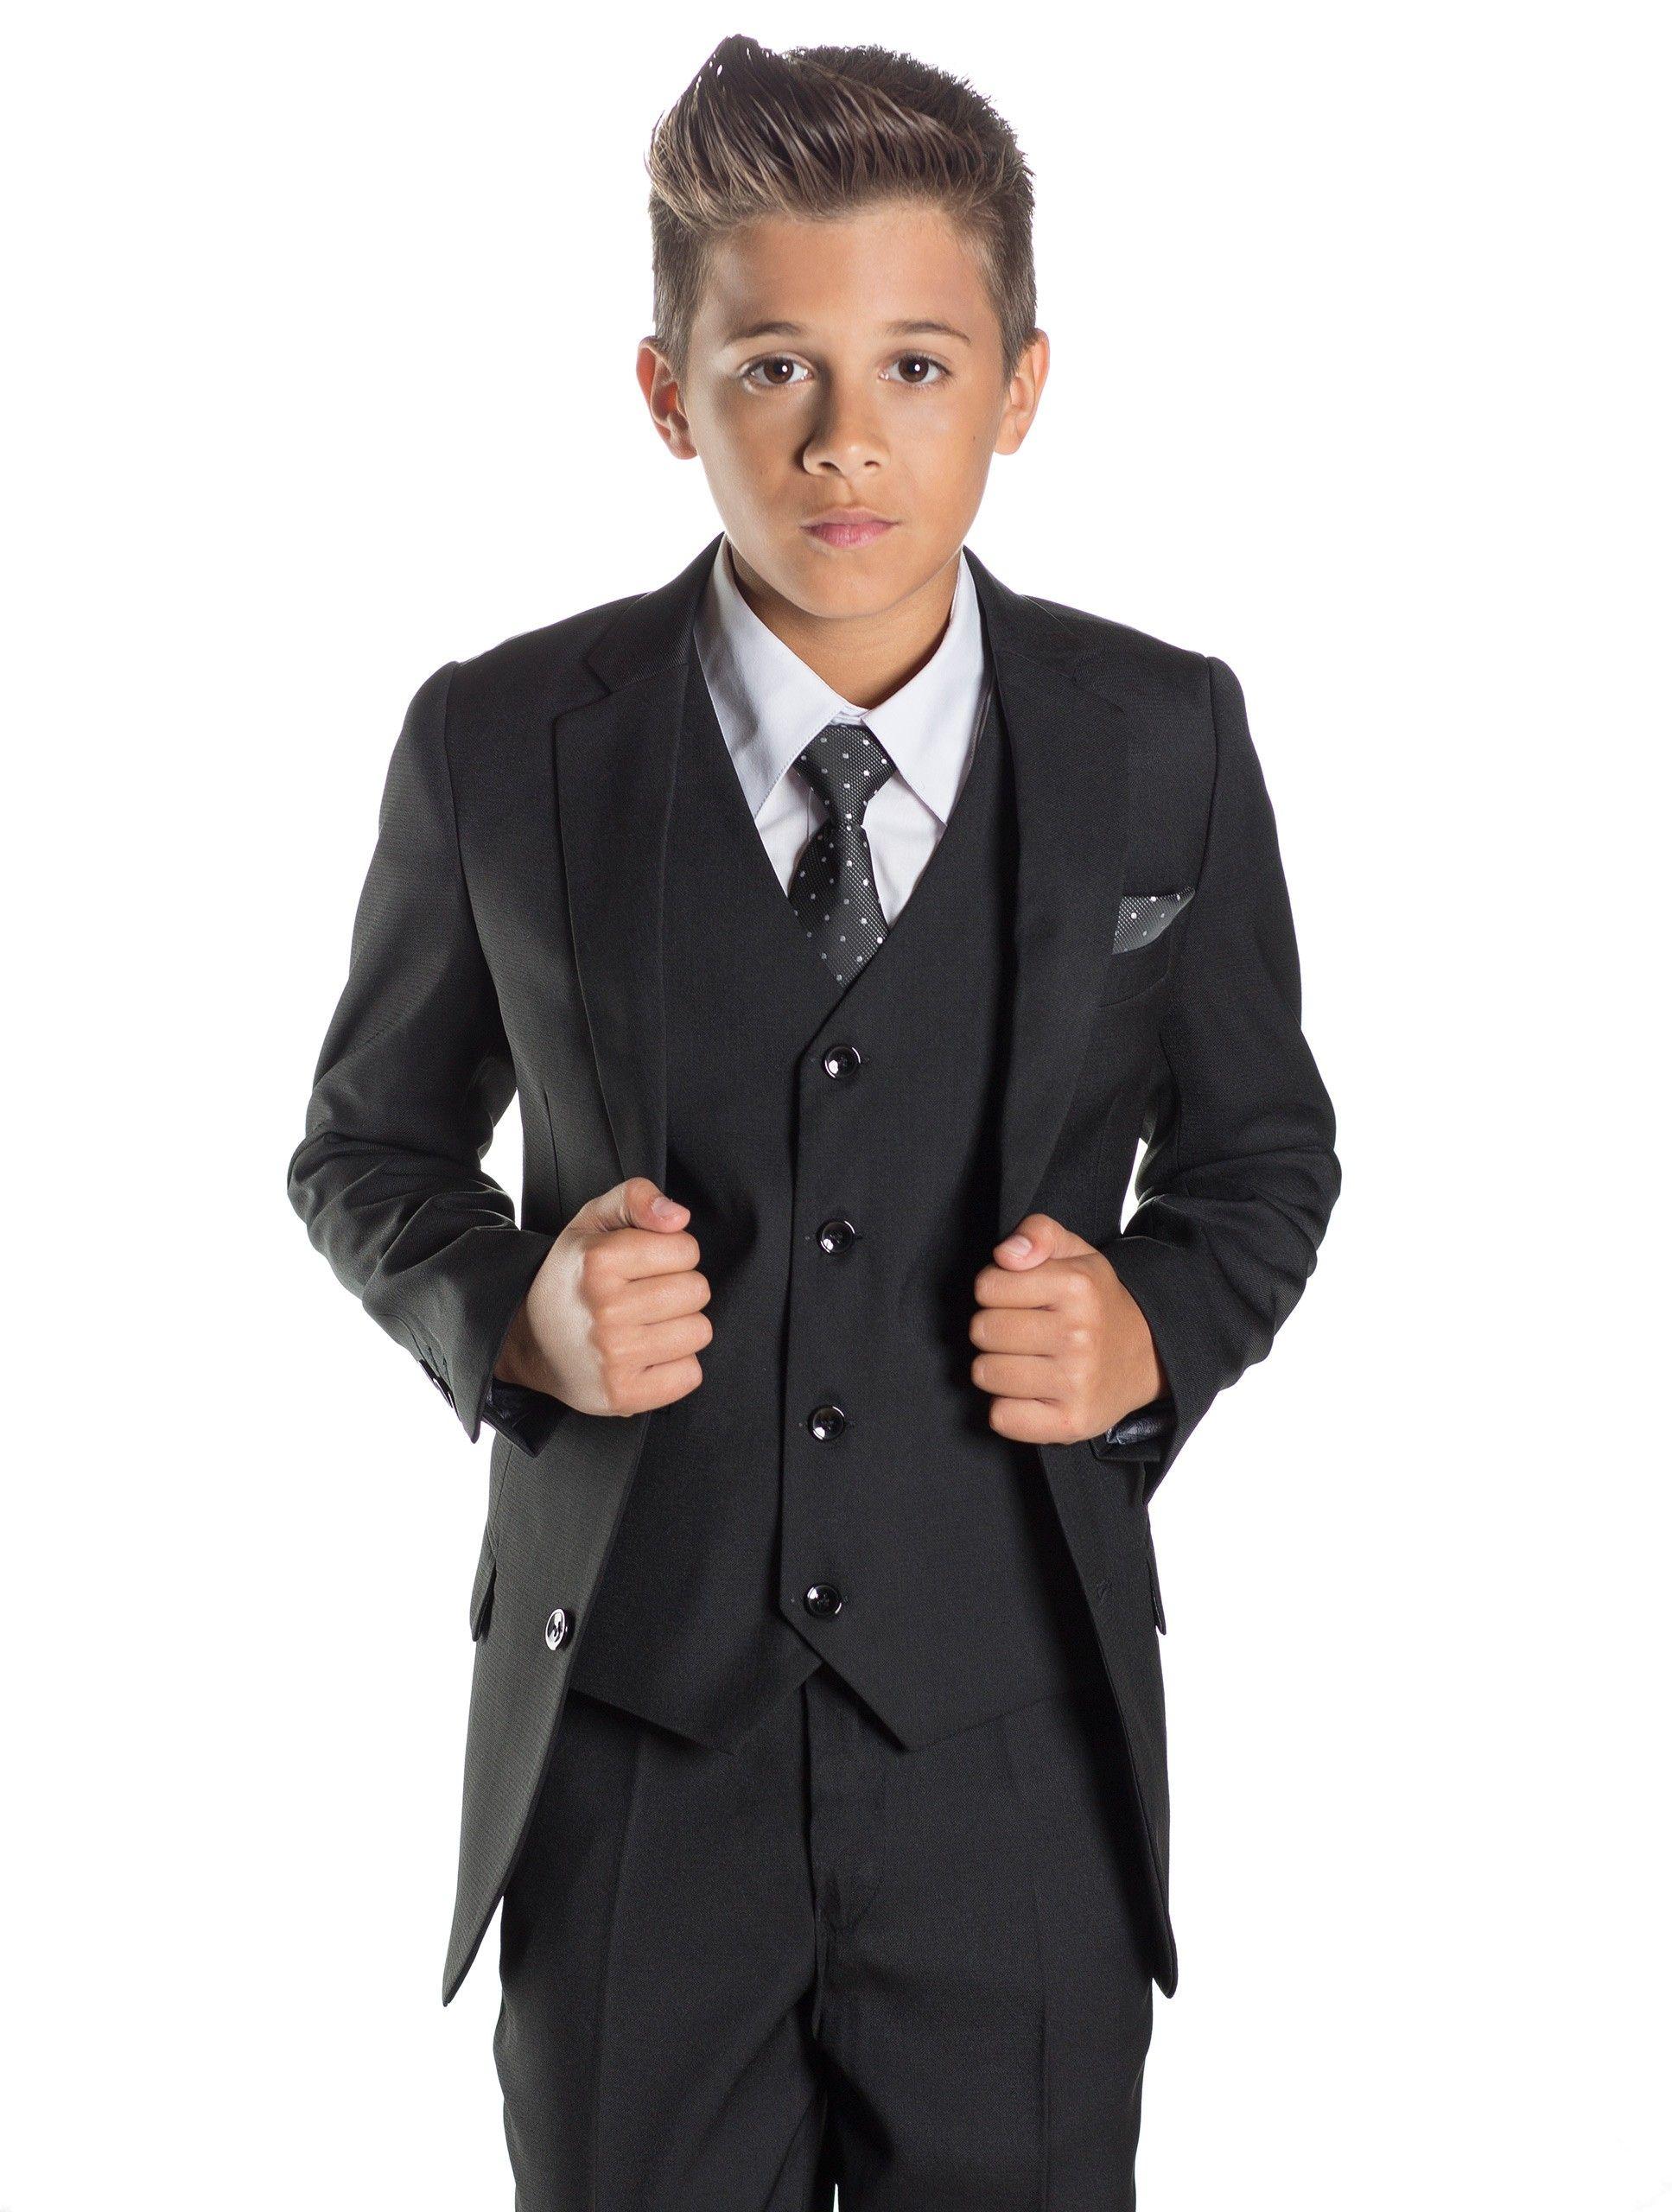 488482c9ebc7b1 Boys black slim fit suit - Philip | wedding | Boys wedding suits ...